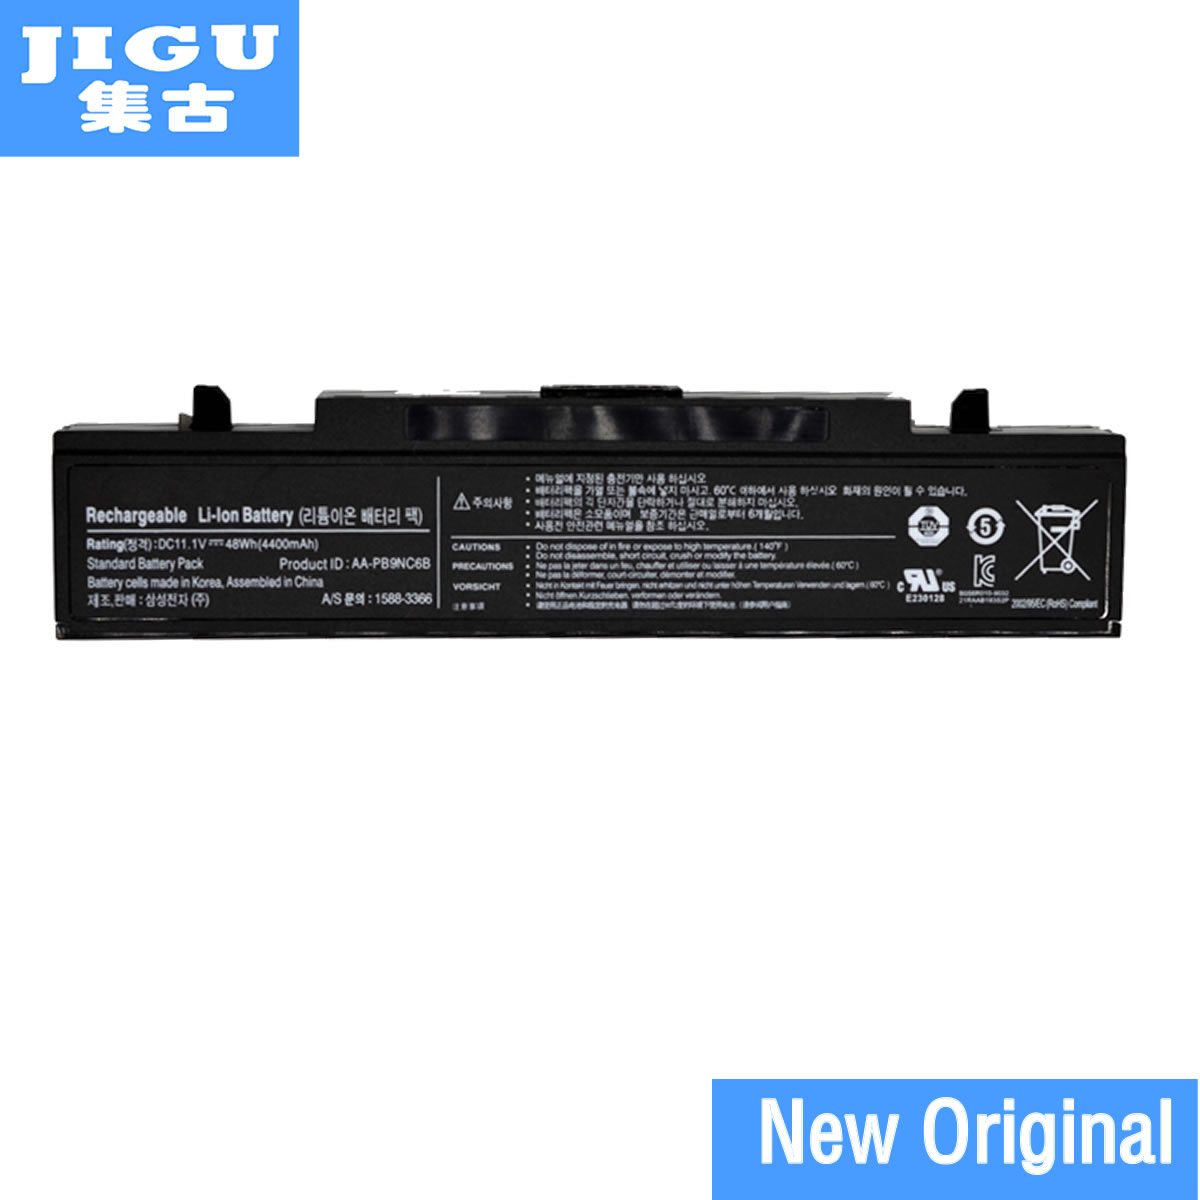 JIGU Original Laptop Battery For SAMSUNG R470 R478 R480 R500 R507 R517 R518 R519 R520 R522 R530 R540 R580 R590 R700 клавиатура ноутбука для lg xnote r570 r590 rb570 rb590 r590 u r590 t черный словенский sv mp 09m16sa 920